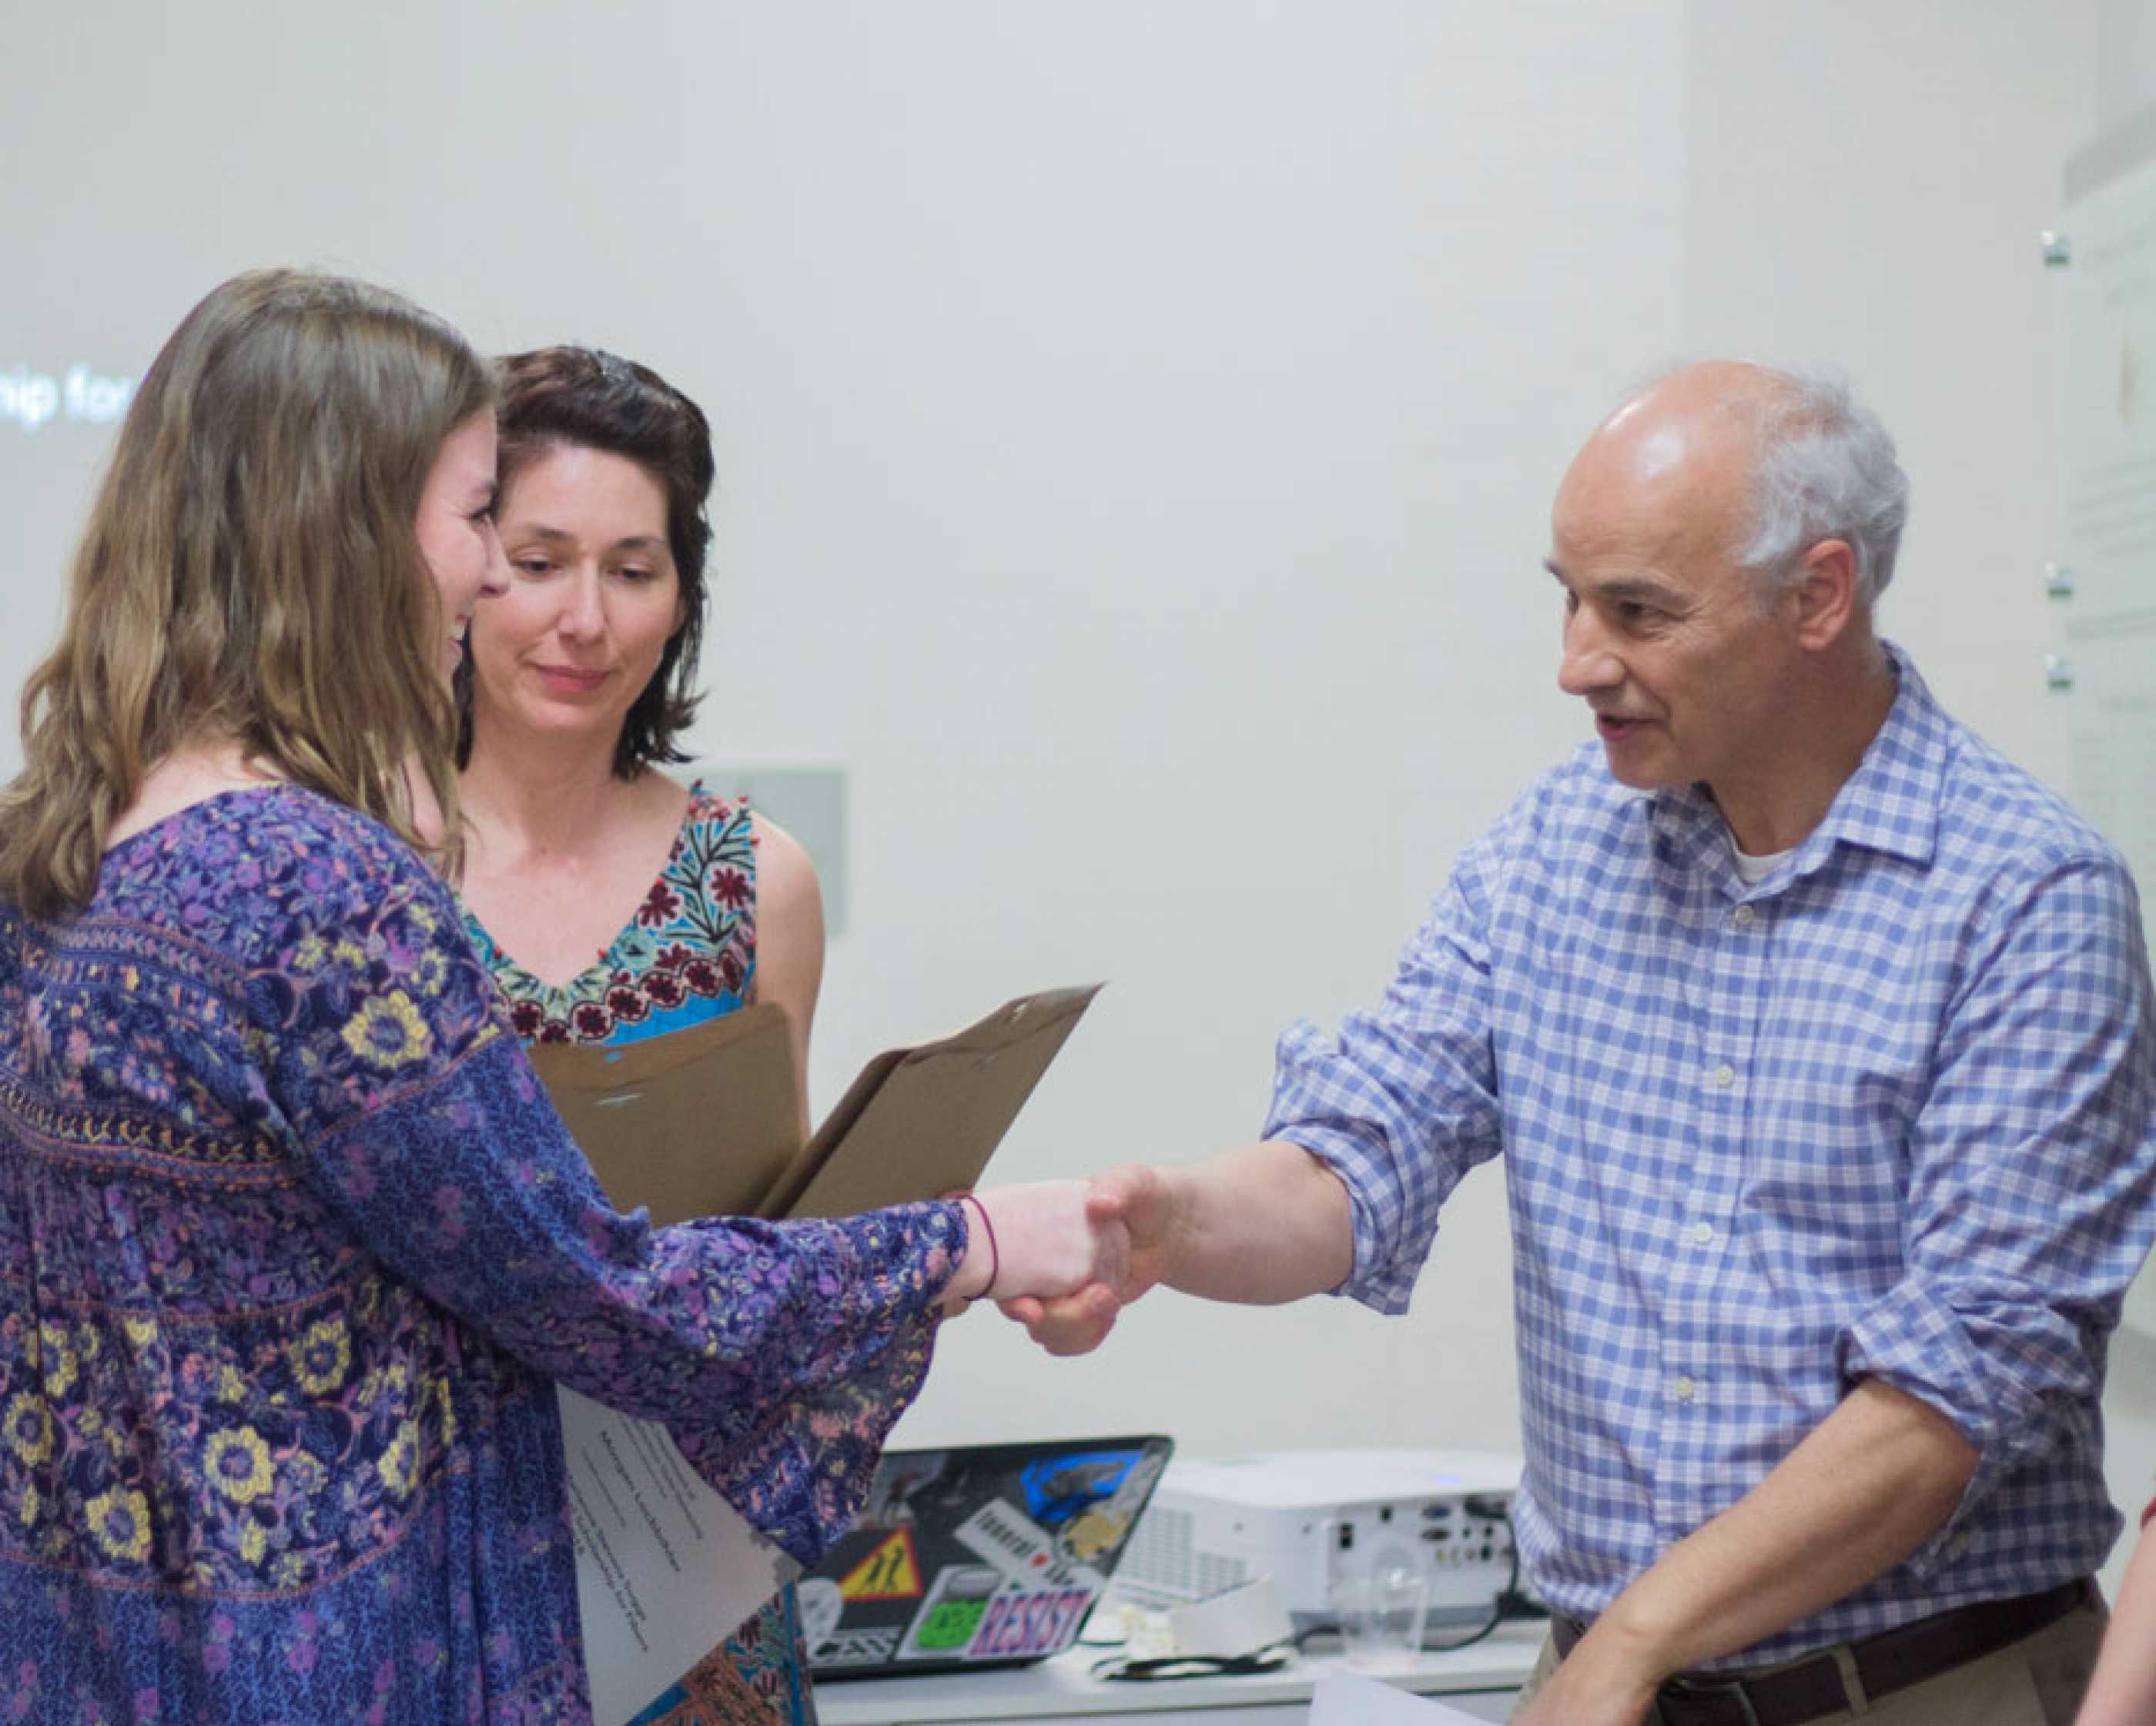 Student receives award at Art Expo